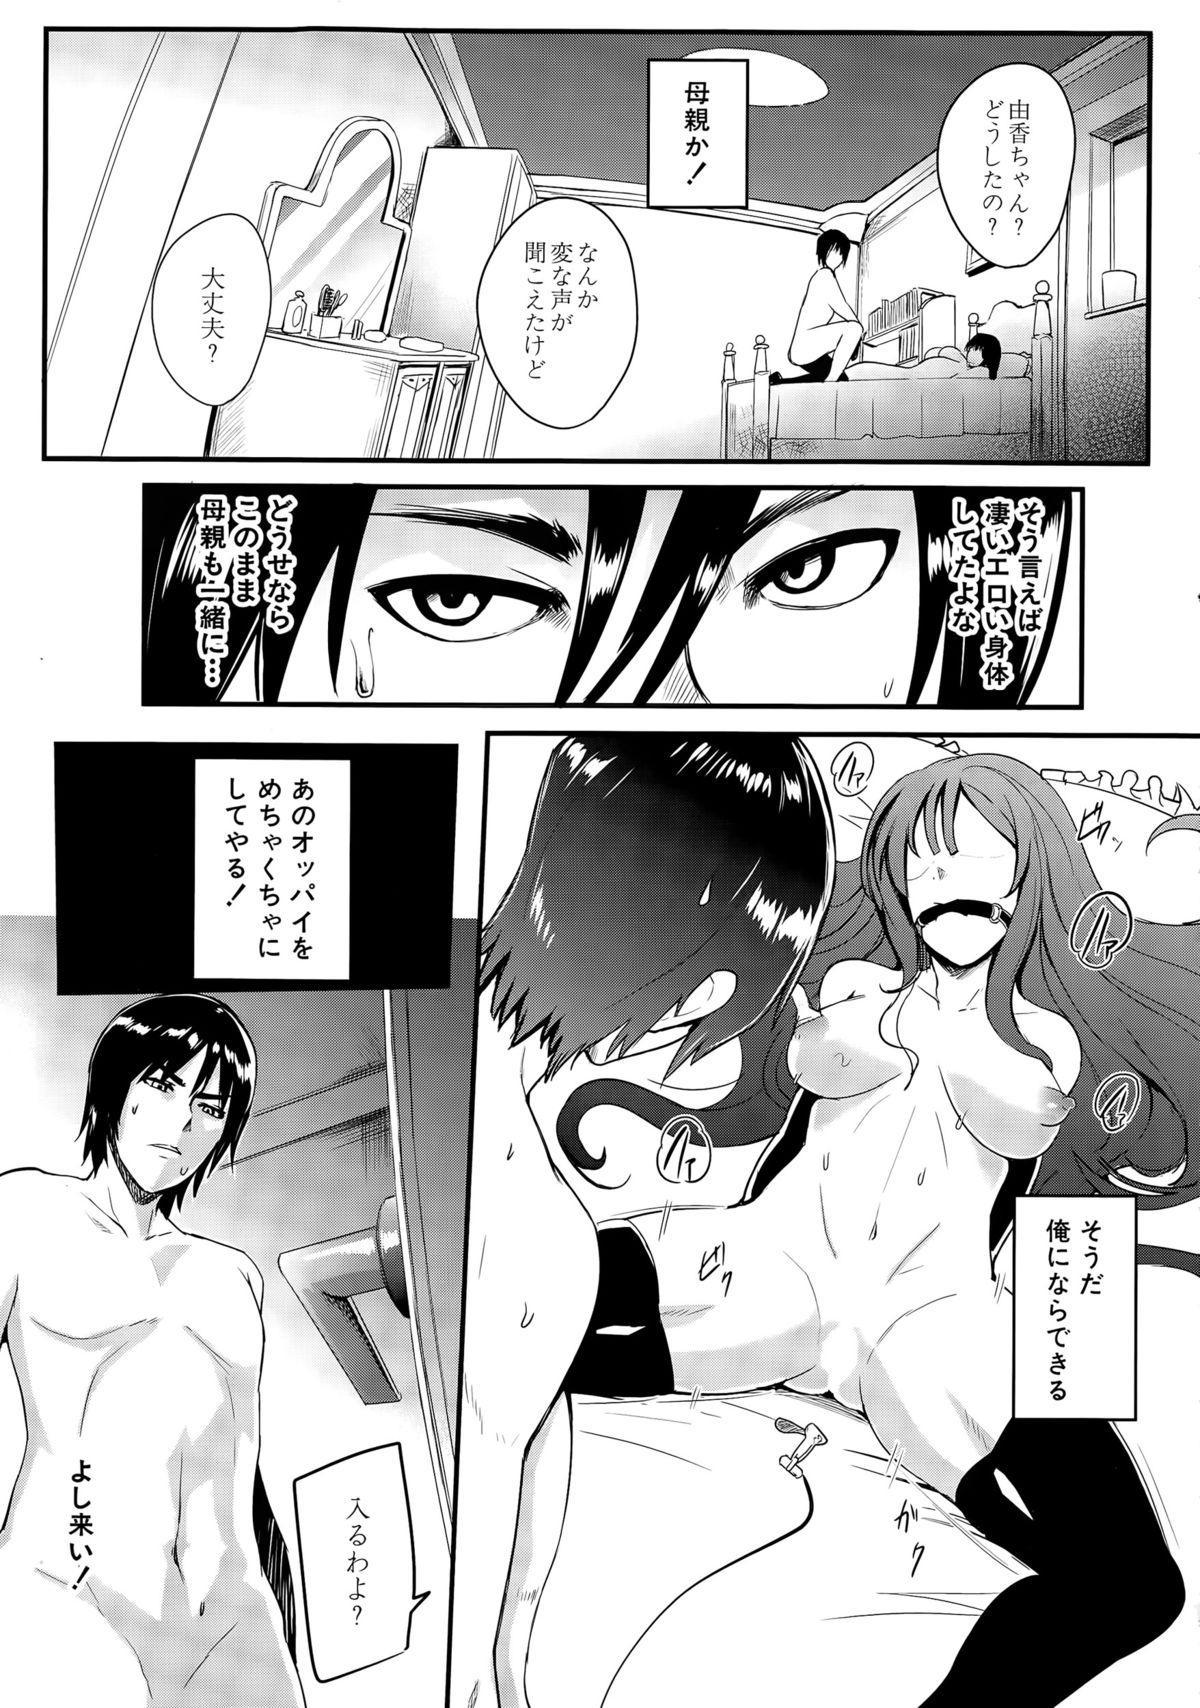 COMIC Mugen Tensei 2015-05 193